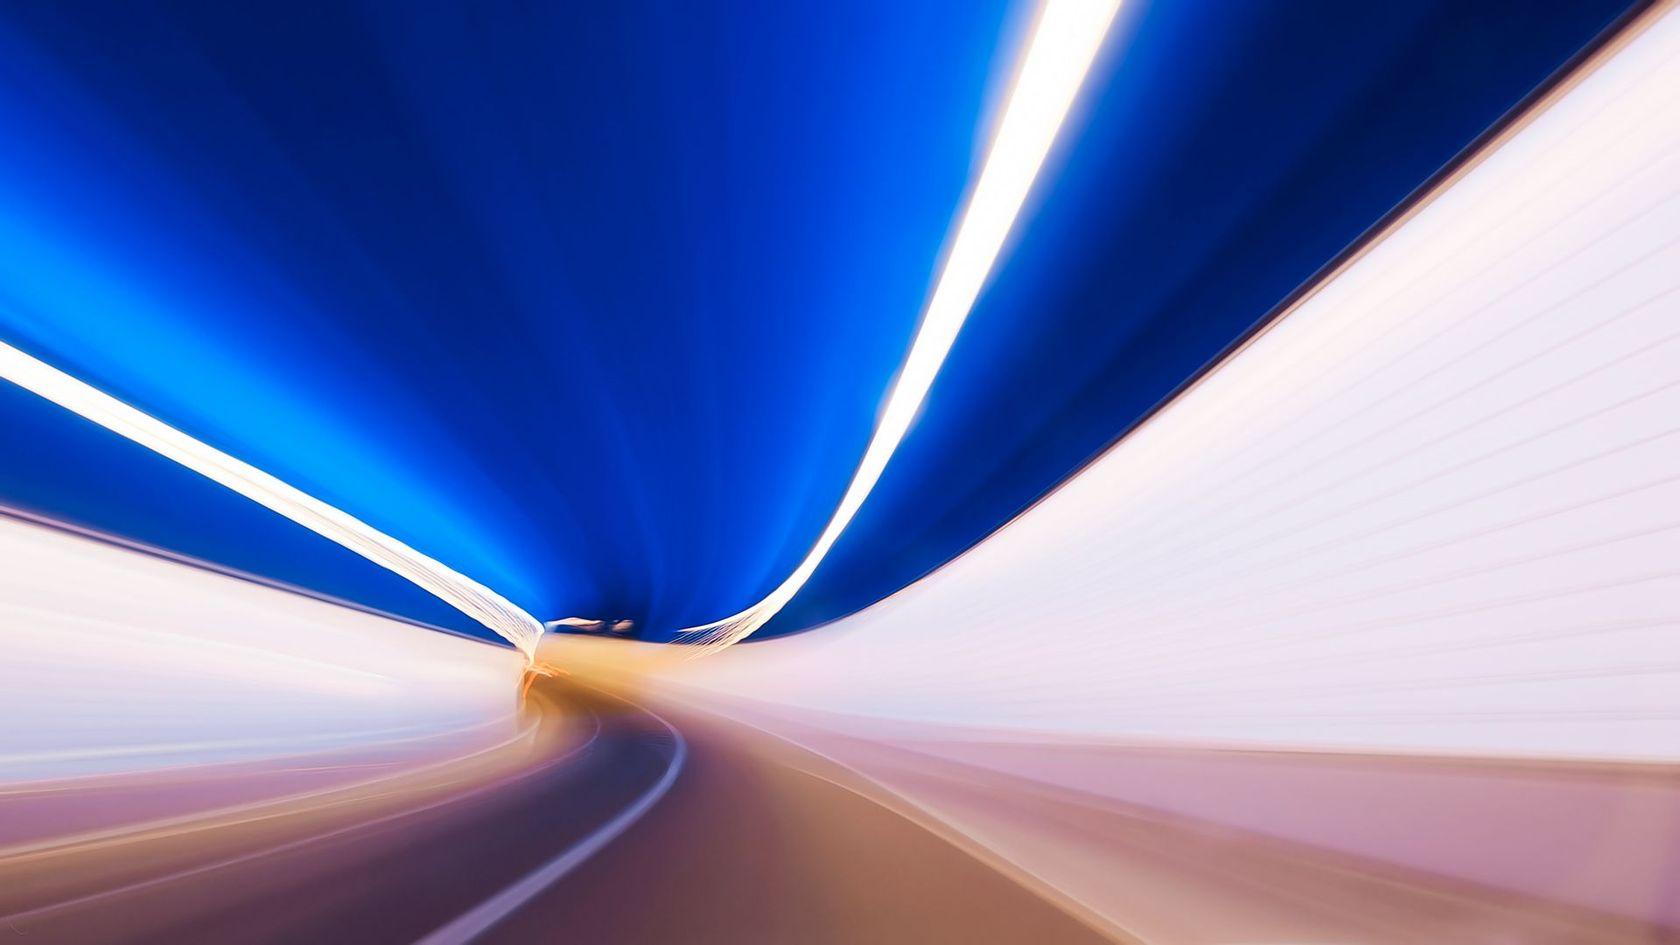 Motion Blur 37081 1680x945 Px HDWallSource